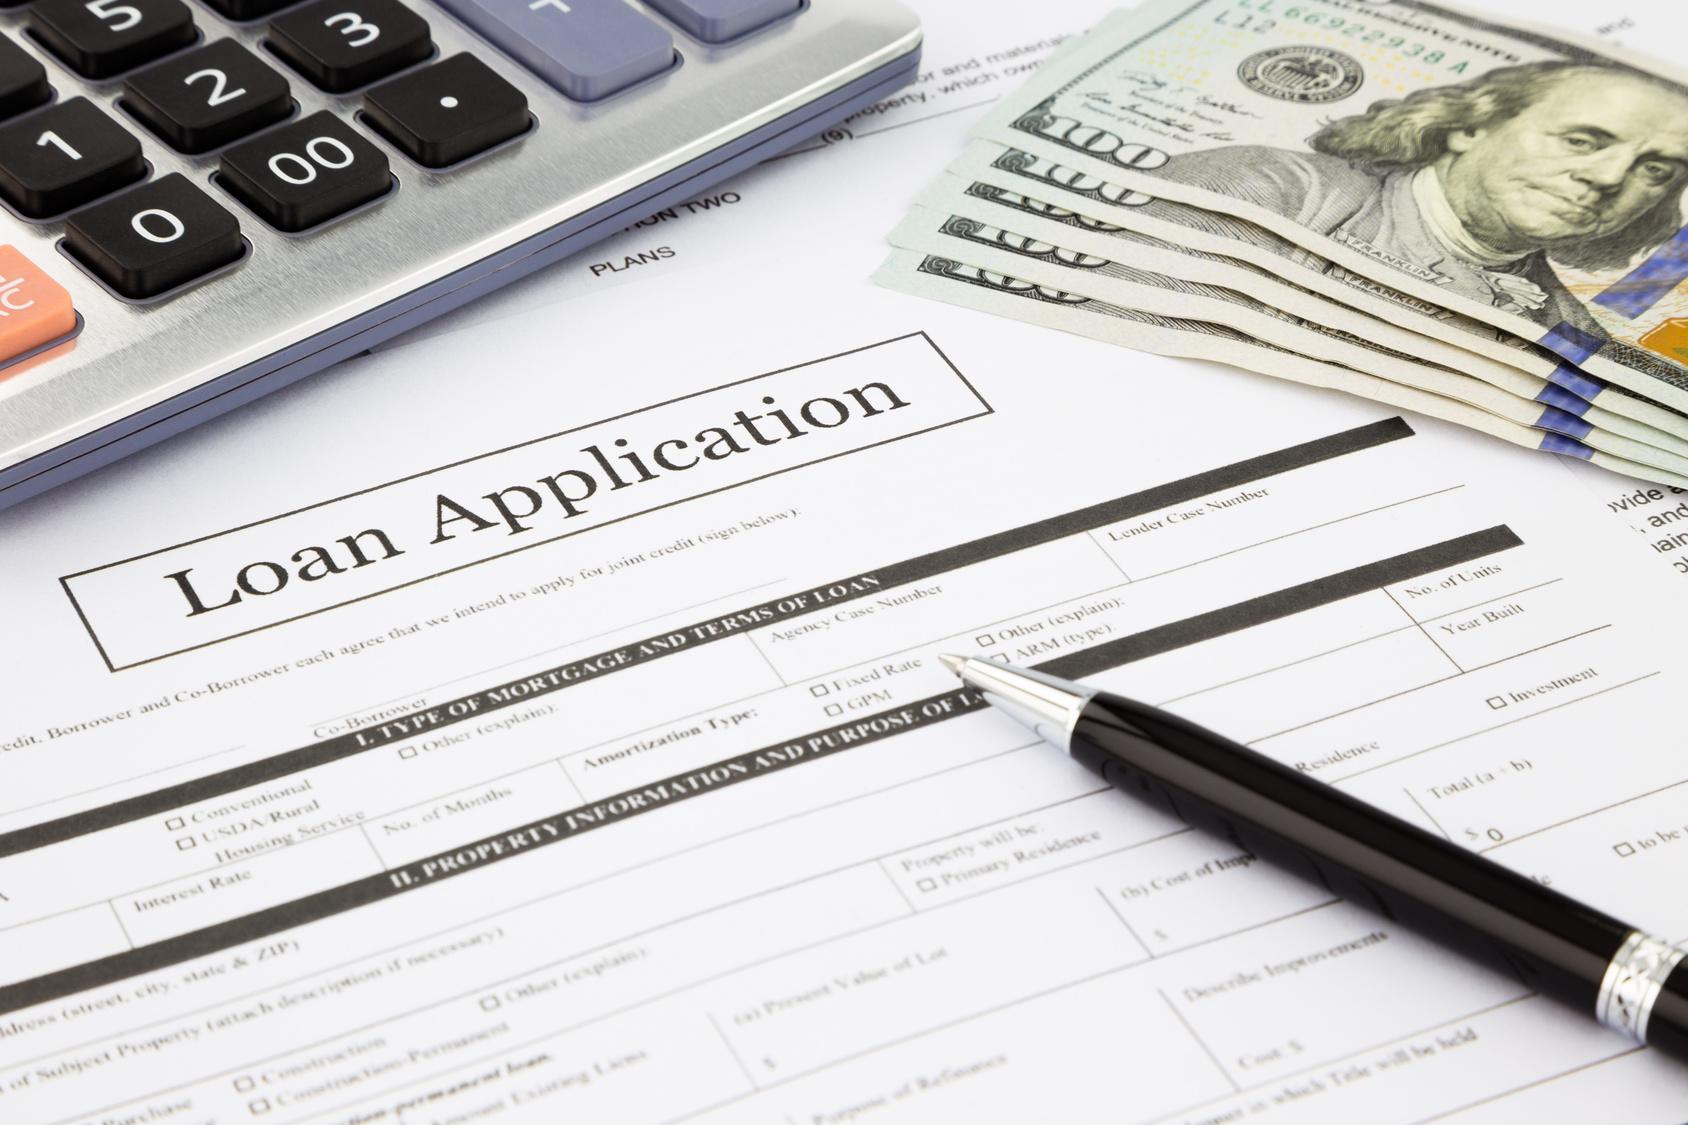 Best Banks Get Personal Loan